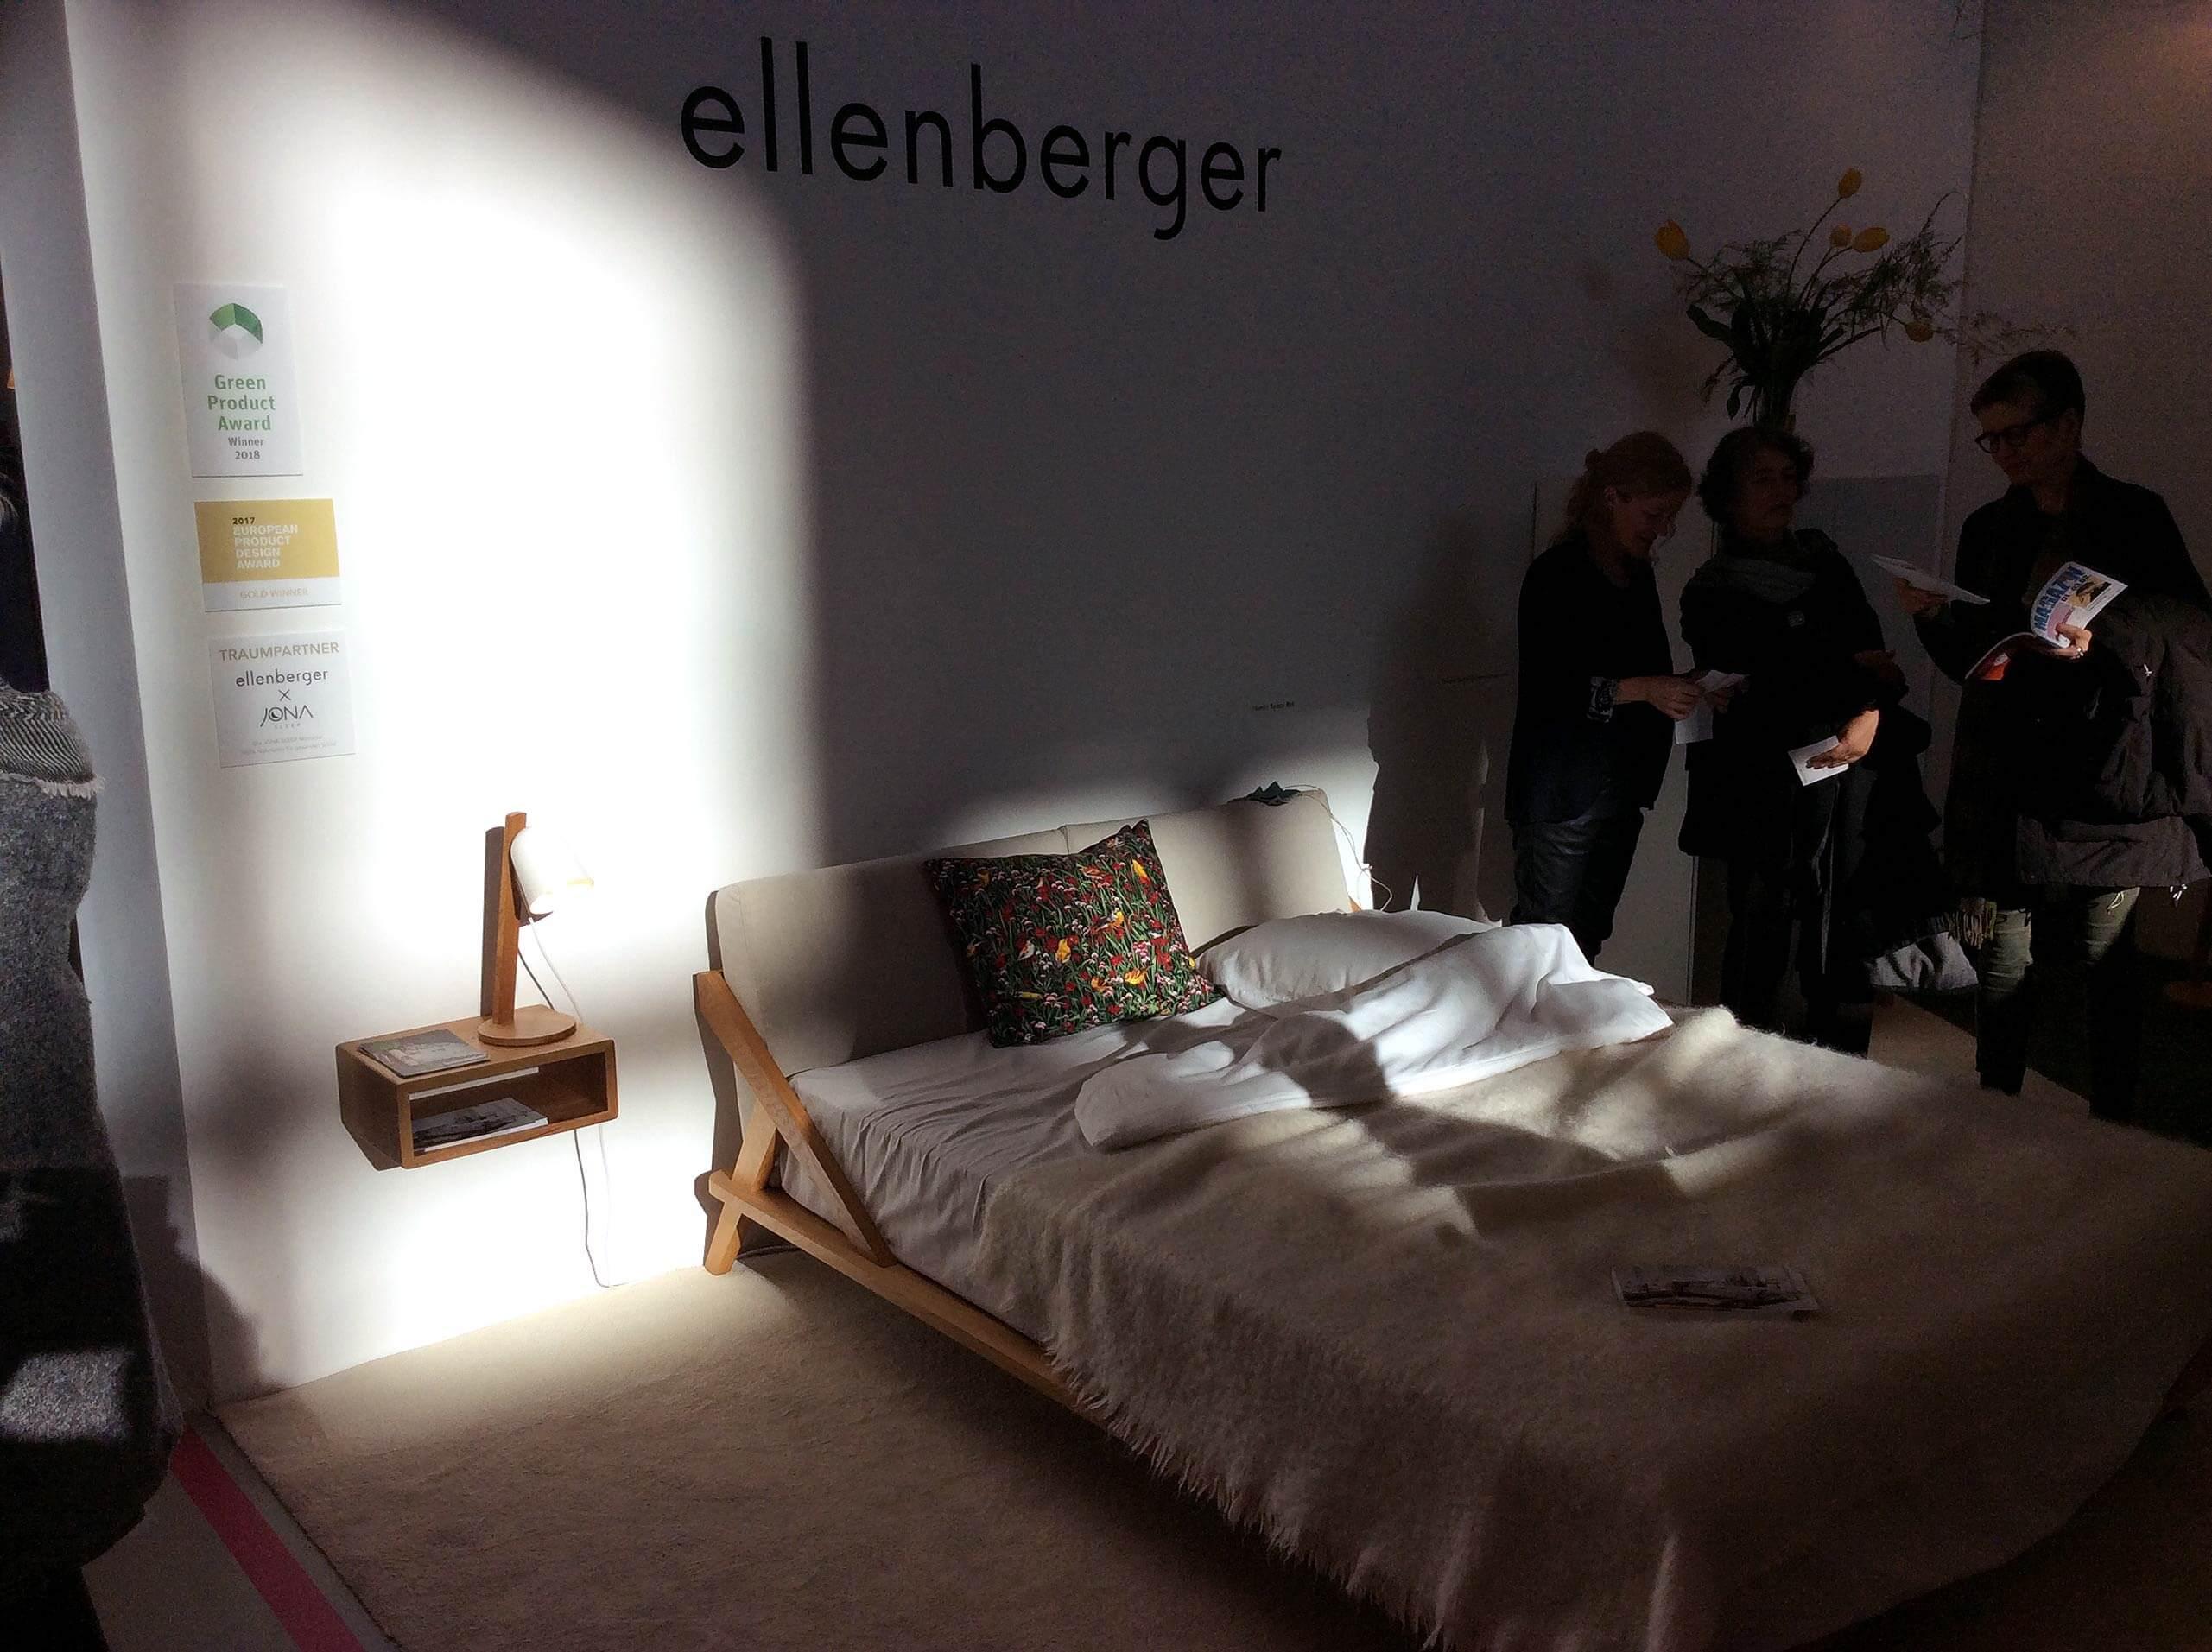 Full Size of Bett Kaufen Hamburg Messe Blickfang 2019 Ellenberger Studio Mit Unterbett Betten Köln Sofa Bettfunktion Regale 80x200 Schubladen Weiß 220 X 160x200 Bett Bett Kaufen Hamburg